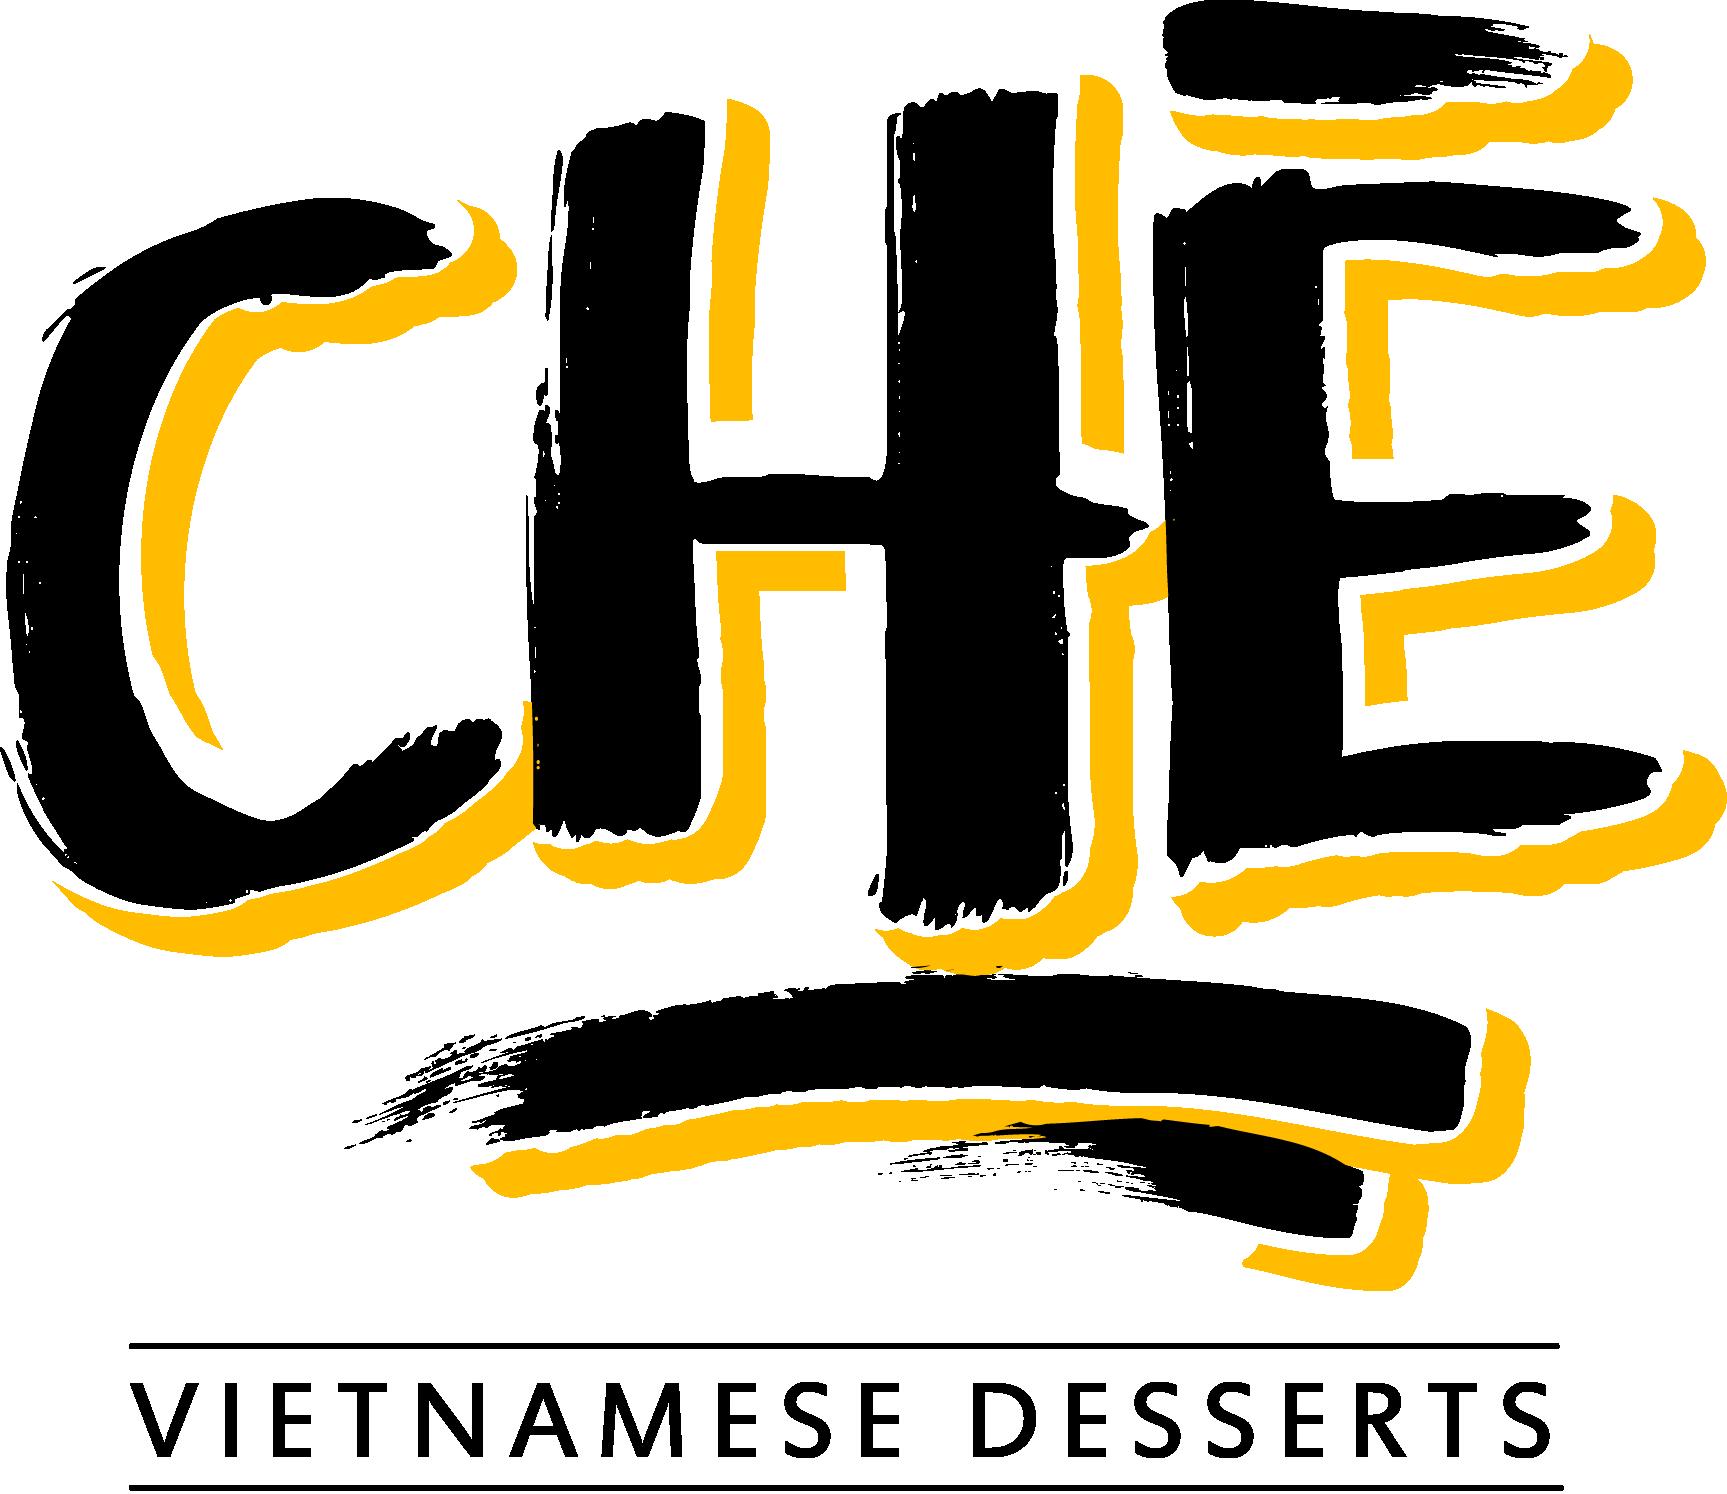 Che   10% discount on all desserts